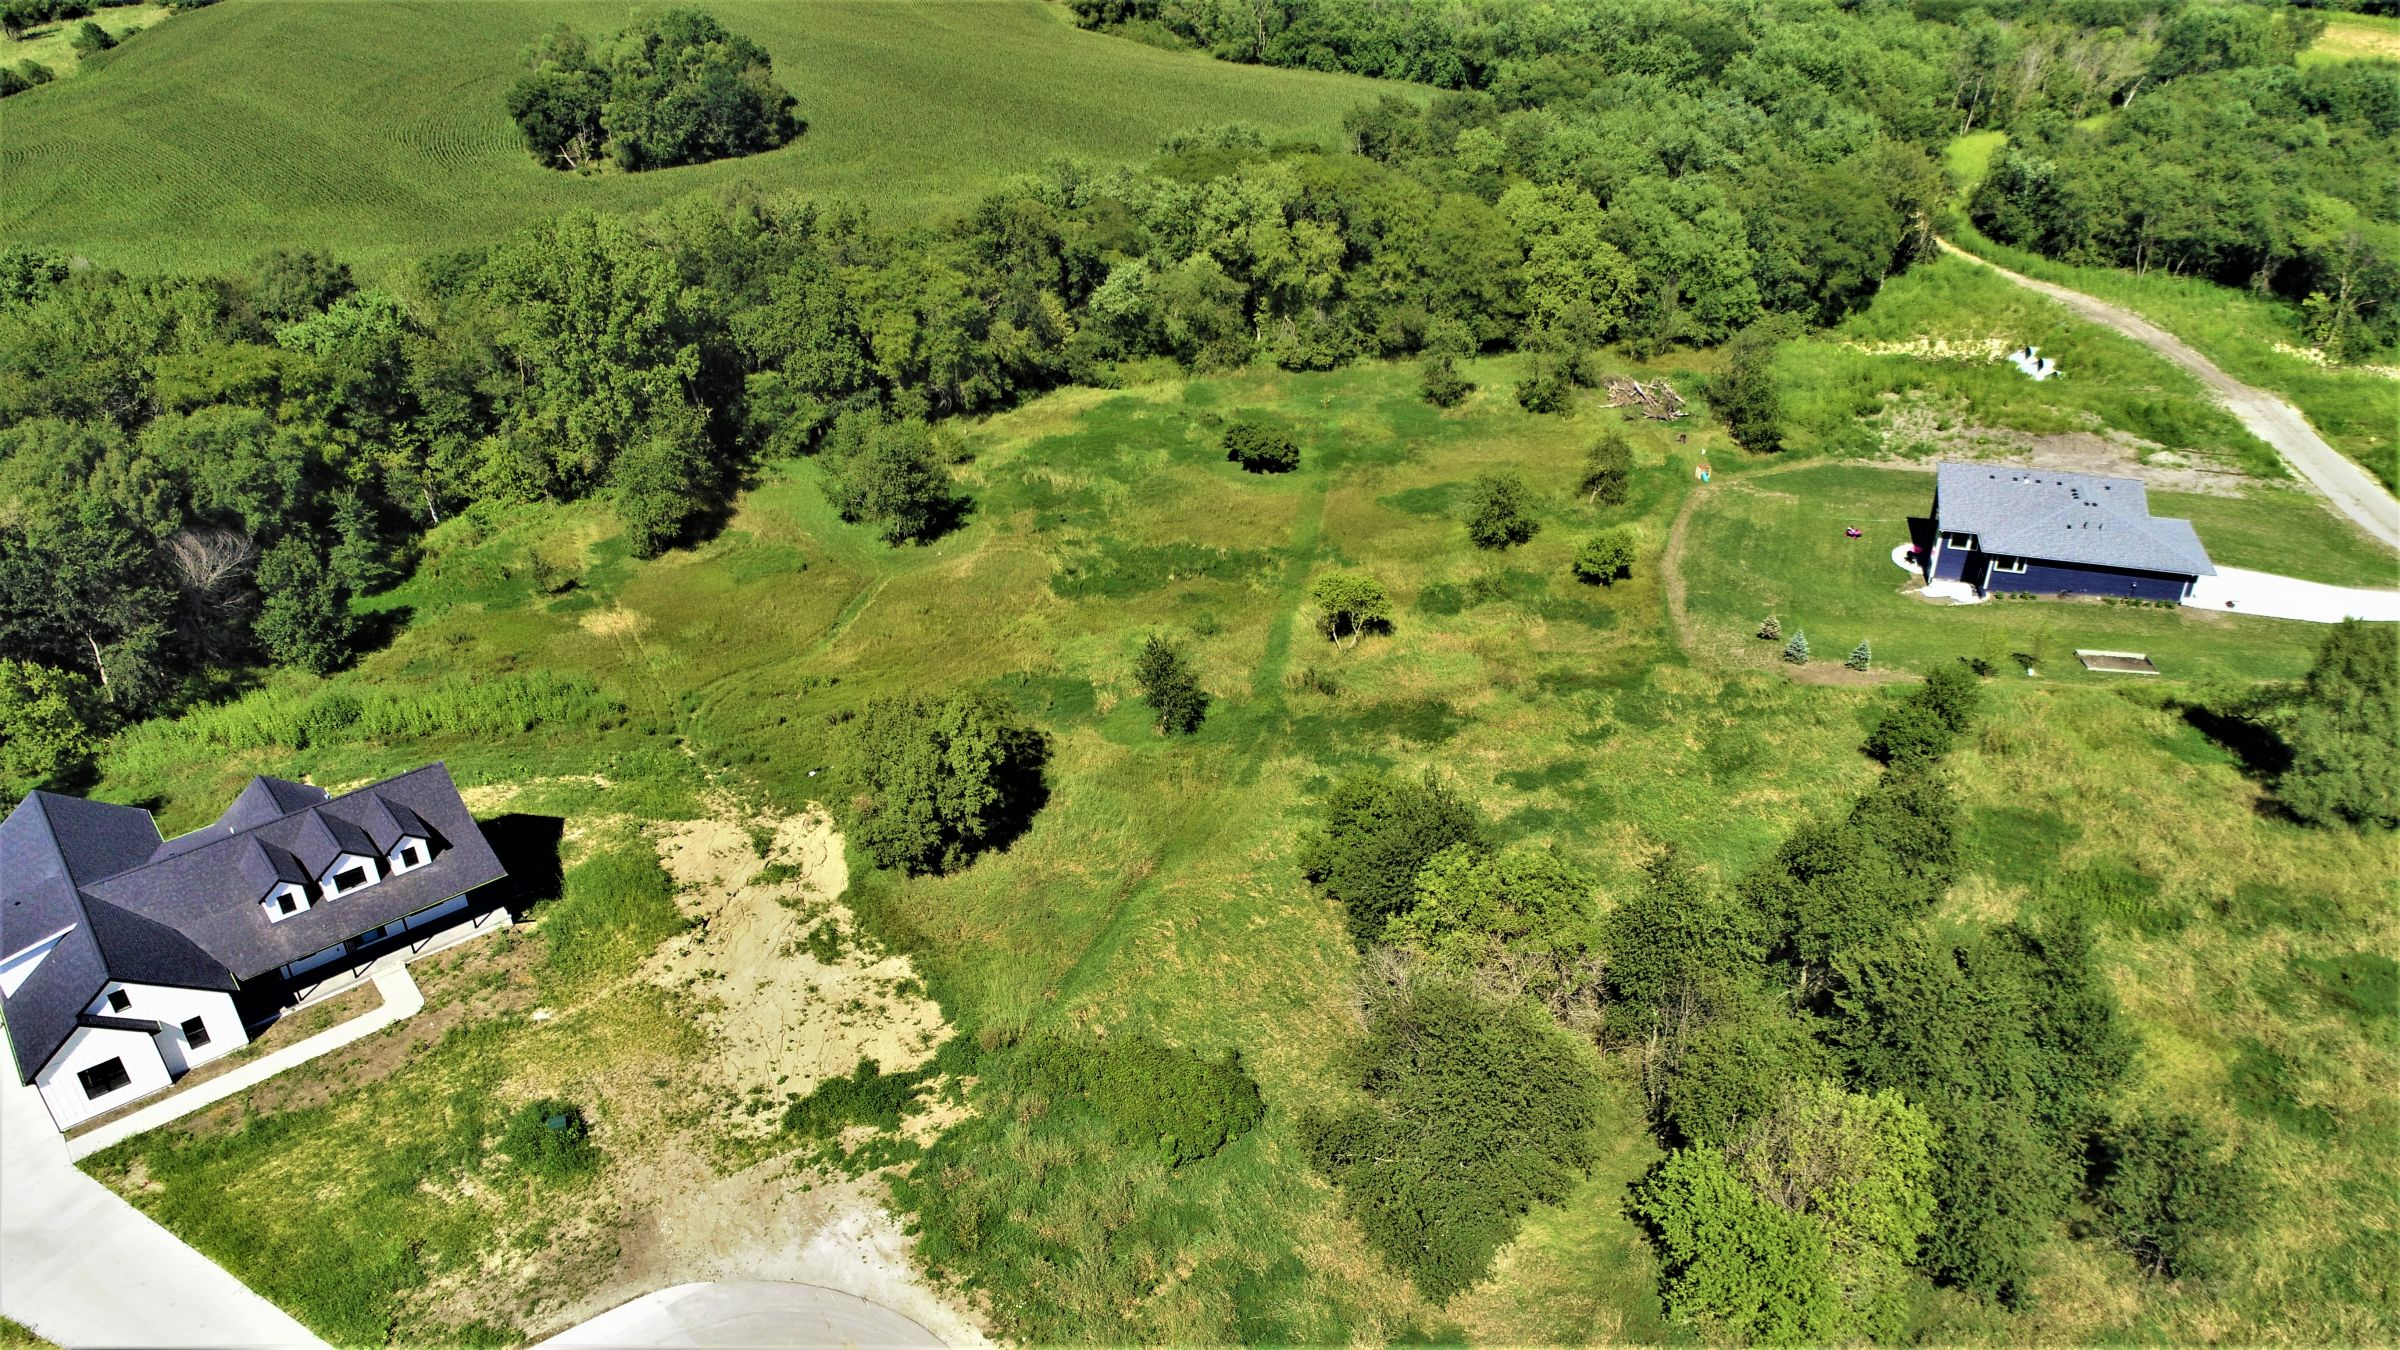 development-land-warren-county-iowa-2-acres-listing-number-15699-0-2021-08-20-205833.JPG